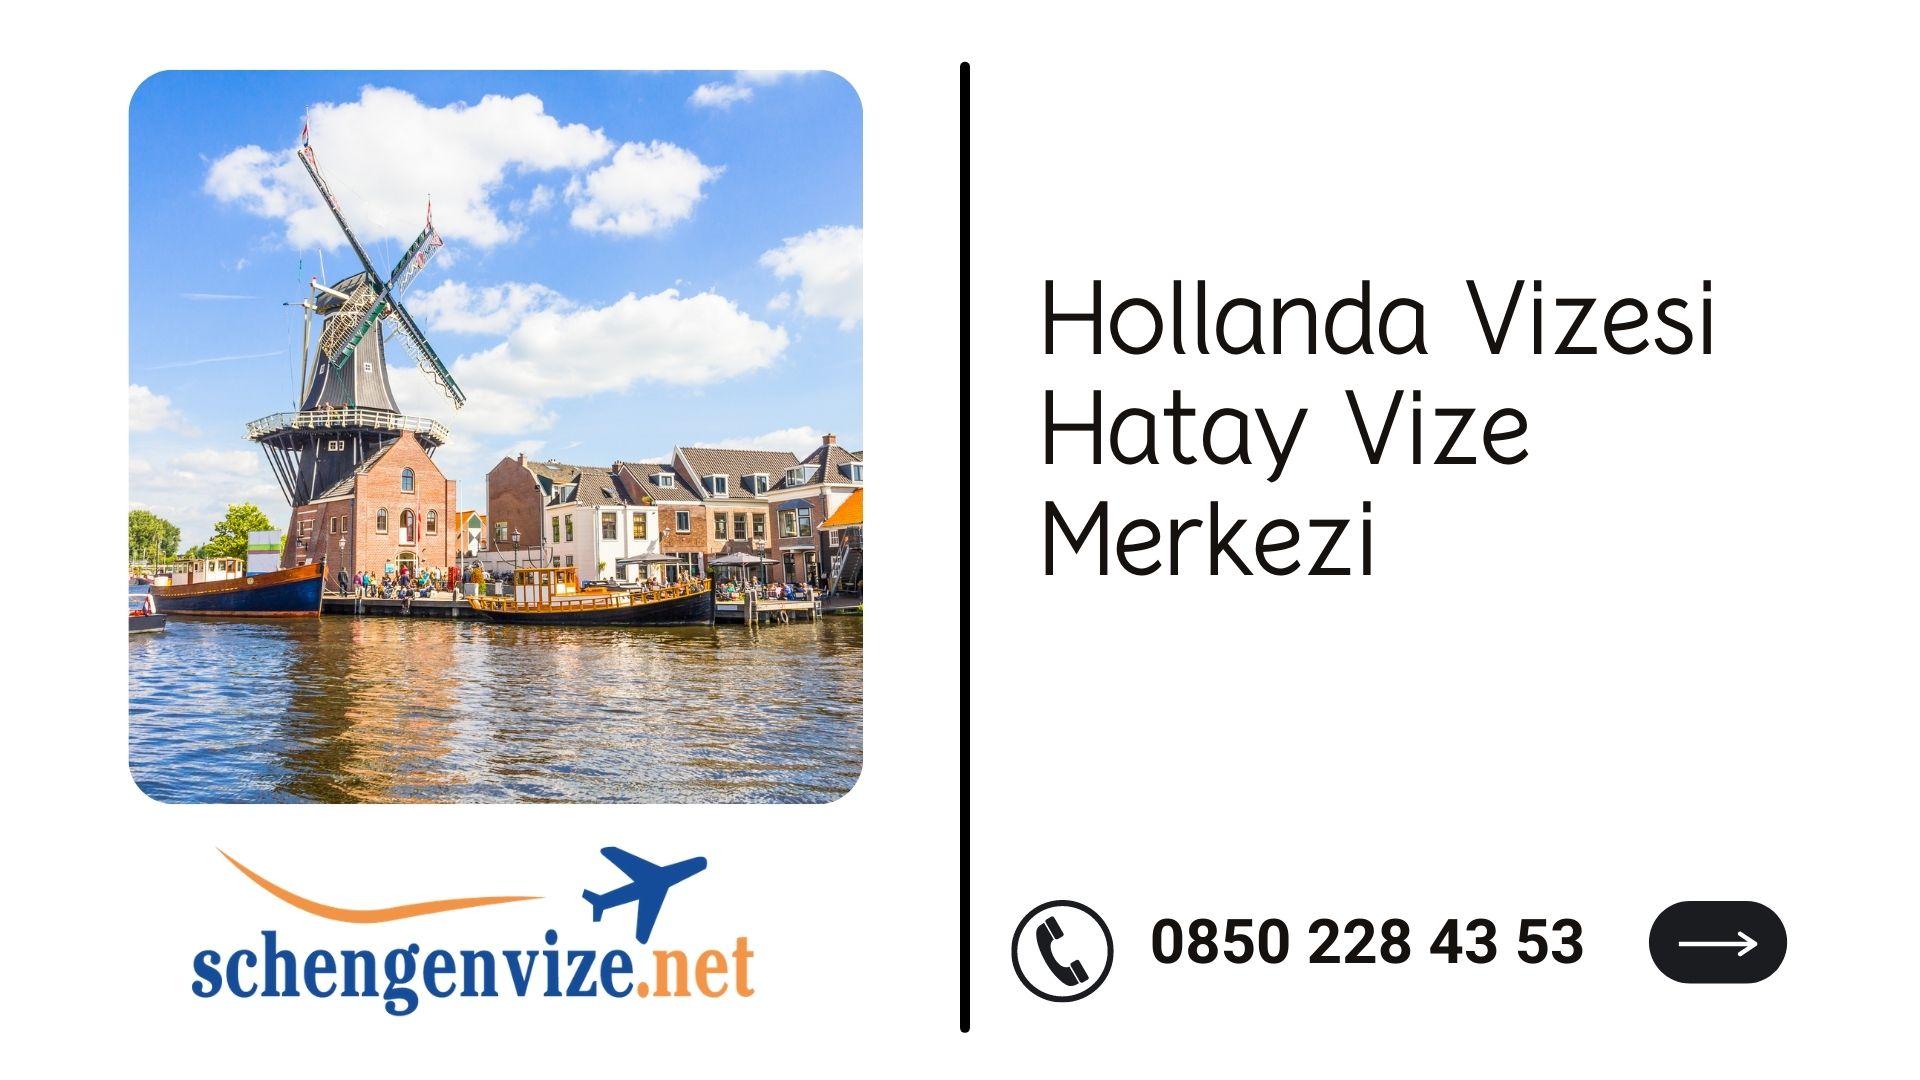 Hollanda Vizesi Hatay Vize Merkezi